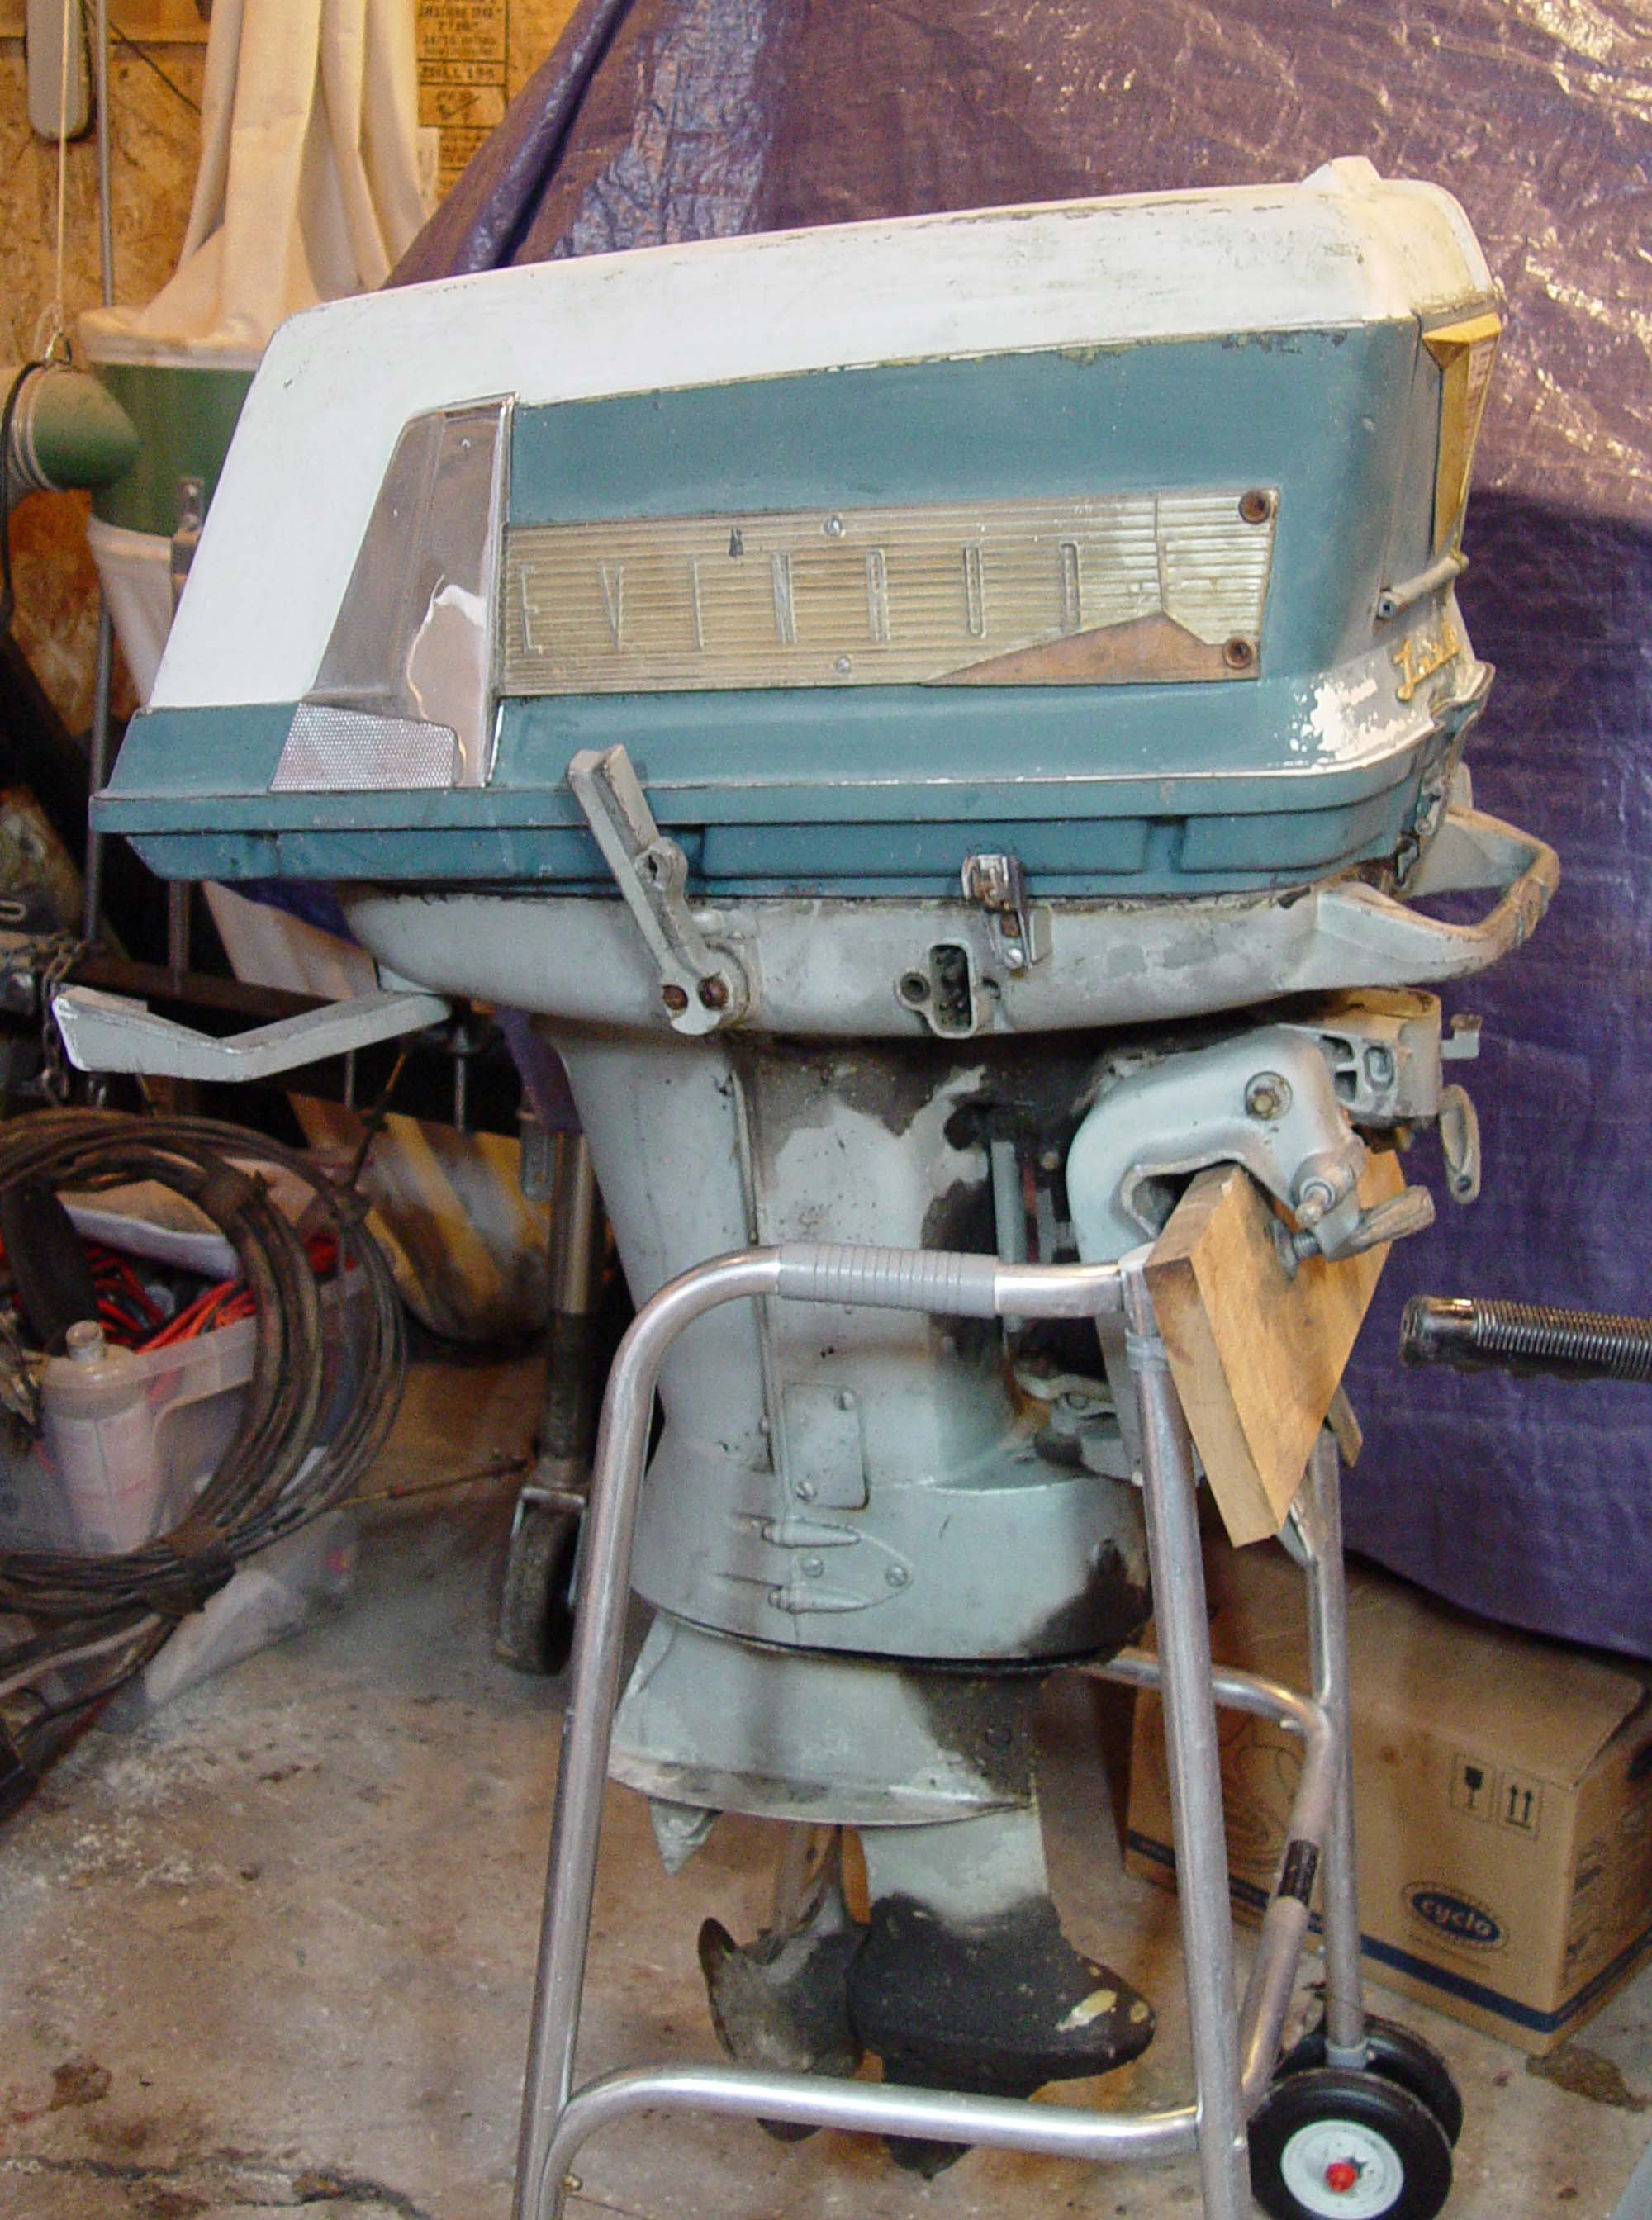 hight resolution of 1959 evinrude lark 35 hp external wiring plug diagram 53 35 hp evinrude wiring harness 1976 evinrude 35 hp wiring diagram